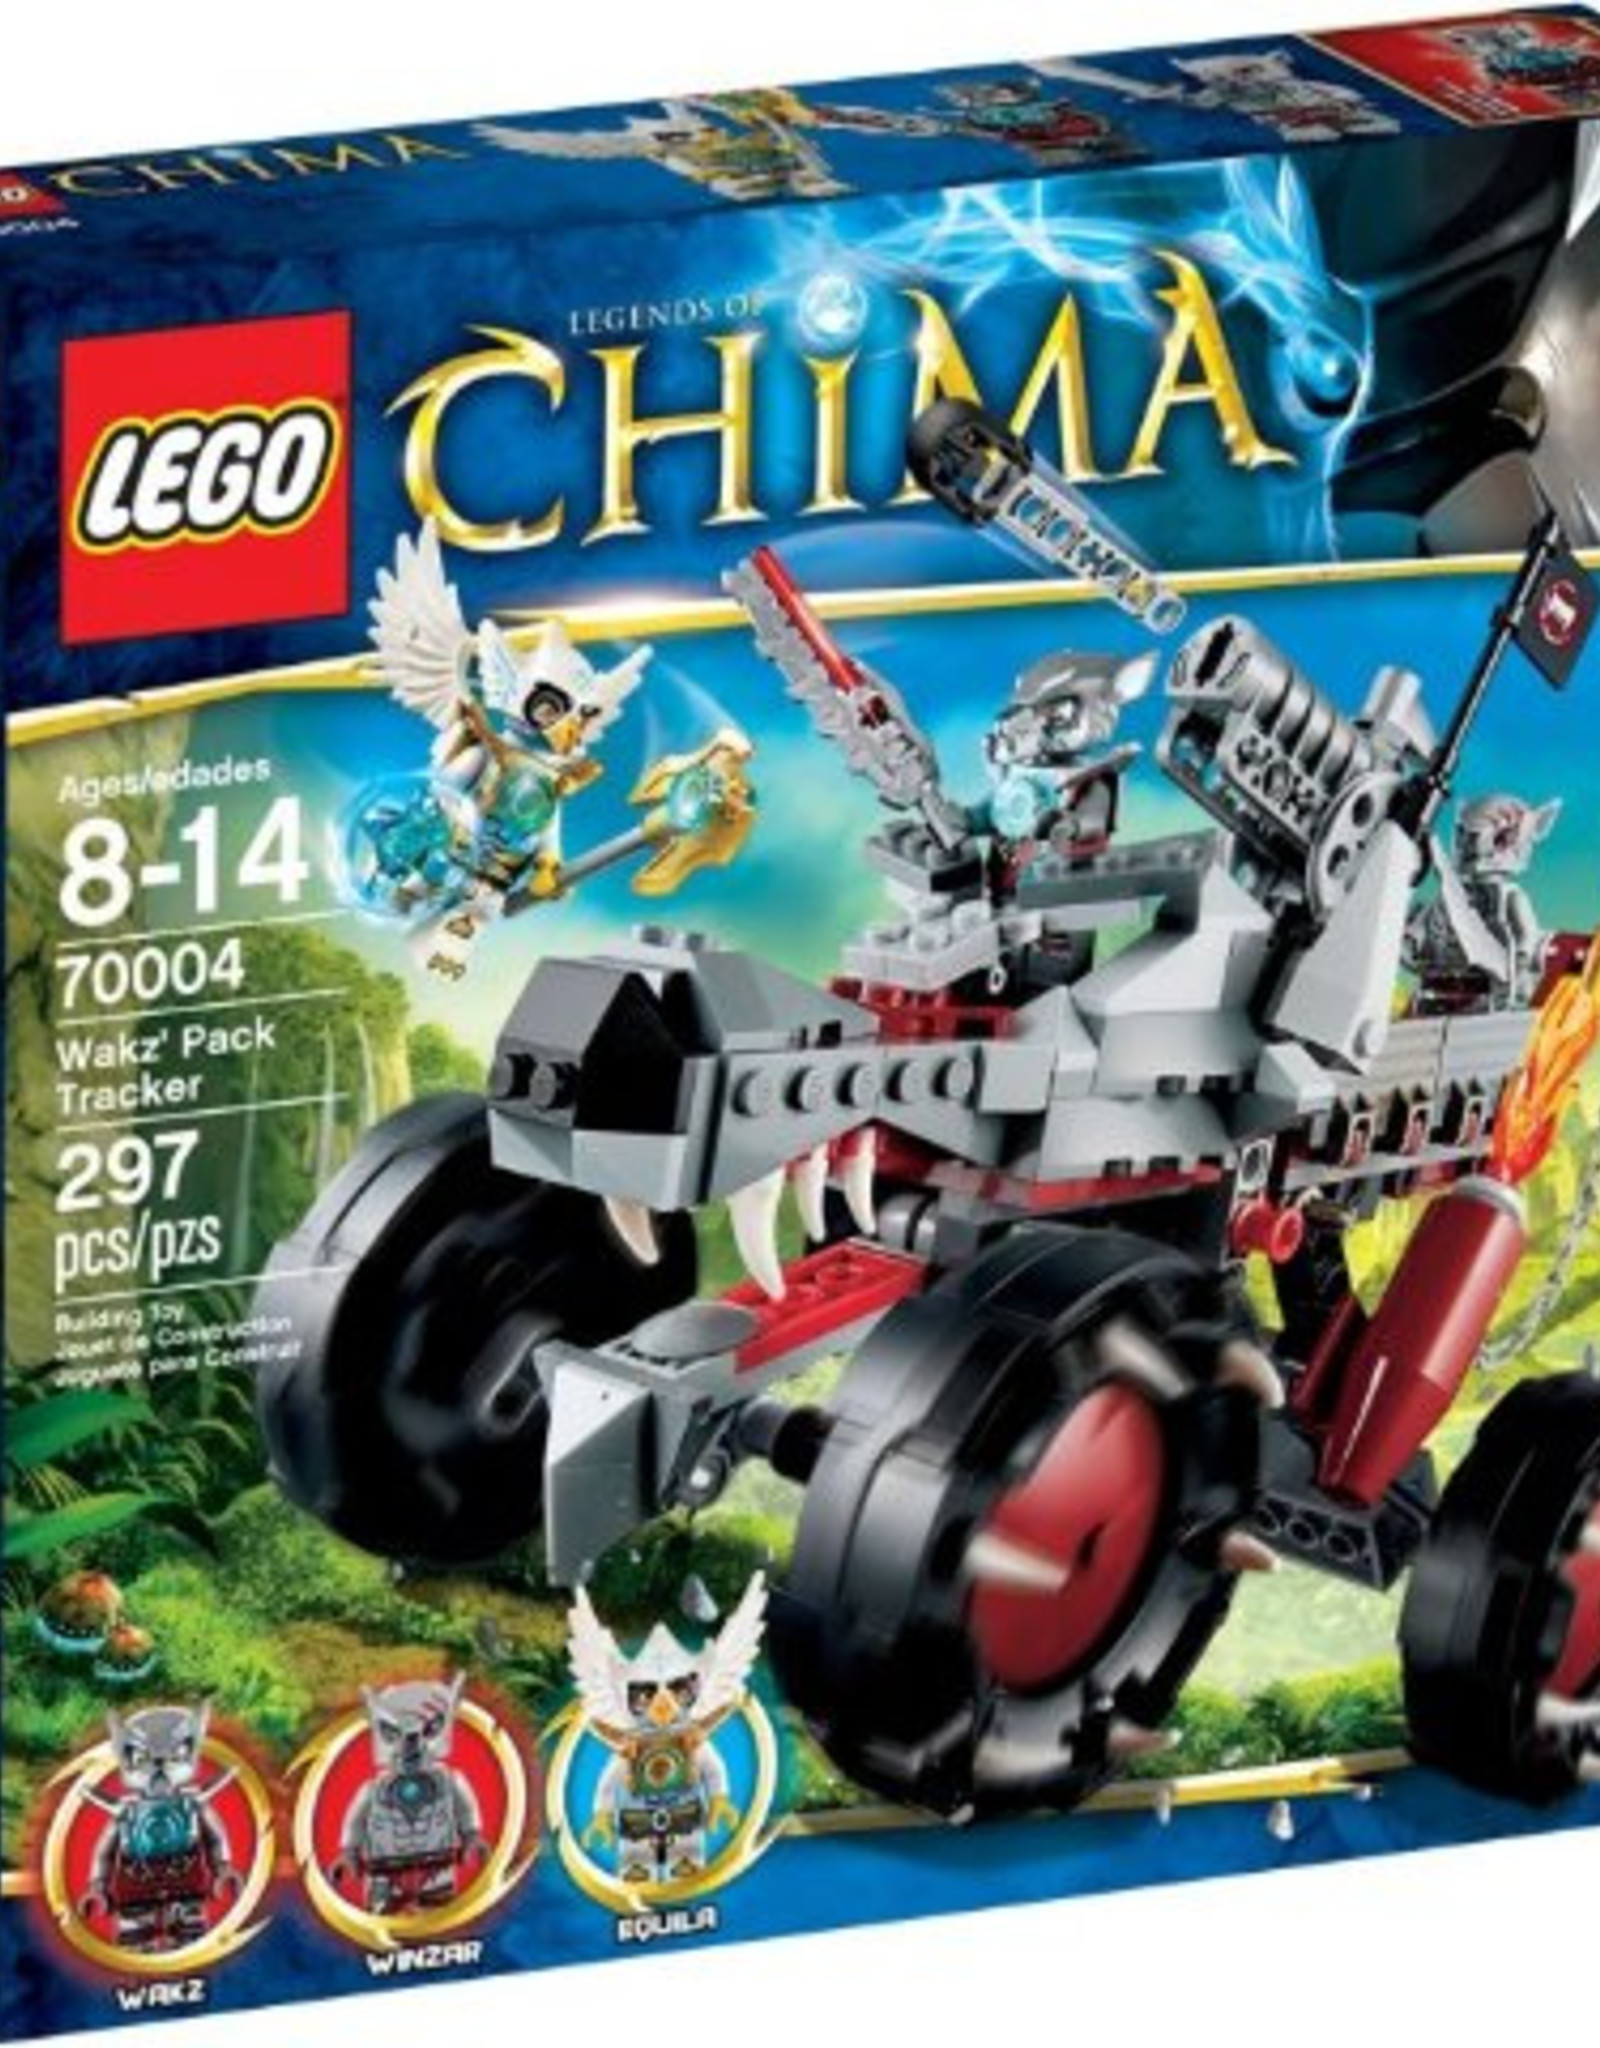 LEGO LEGO 70004 Wakz's Packtracker CHIMA